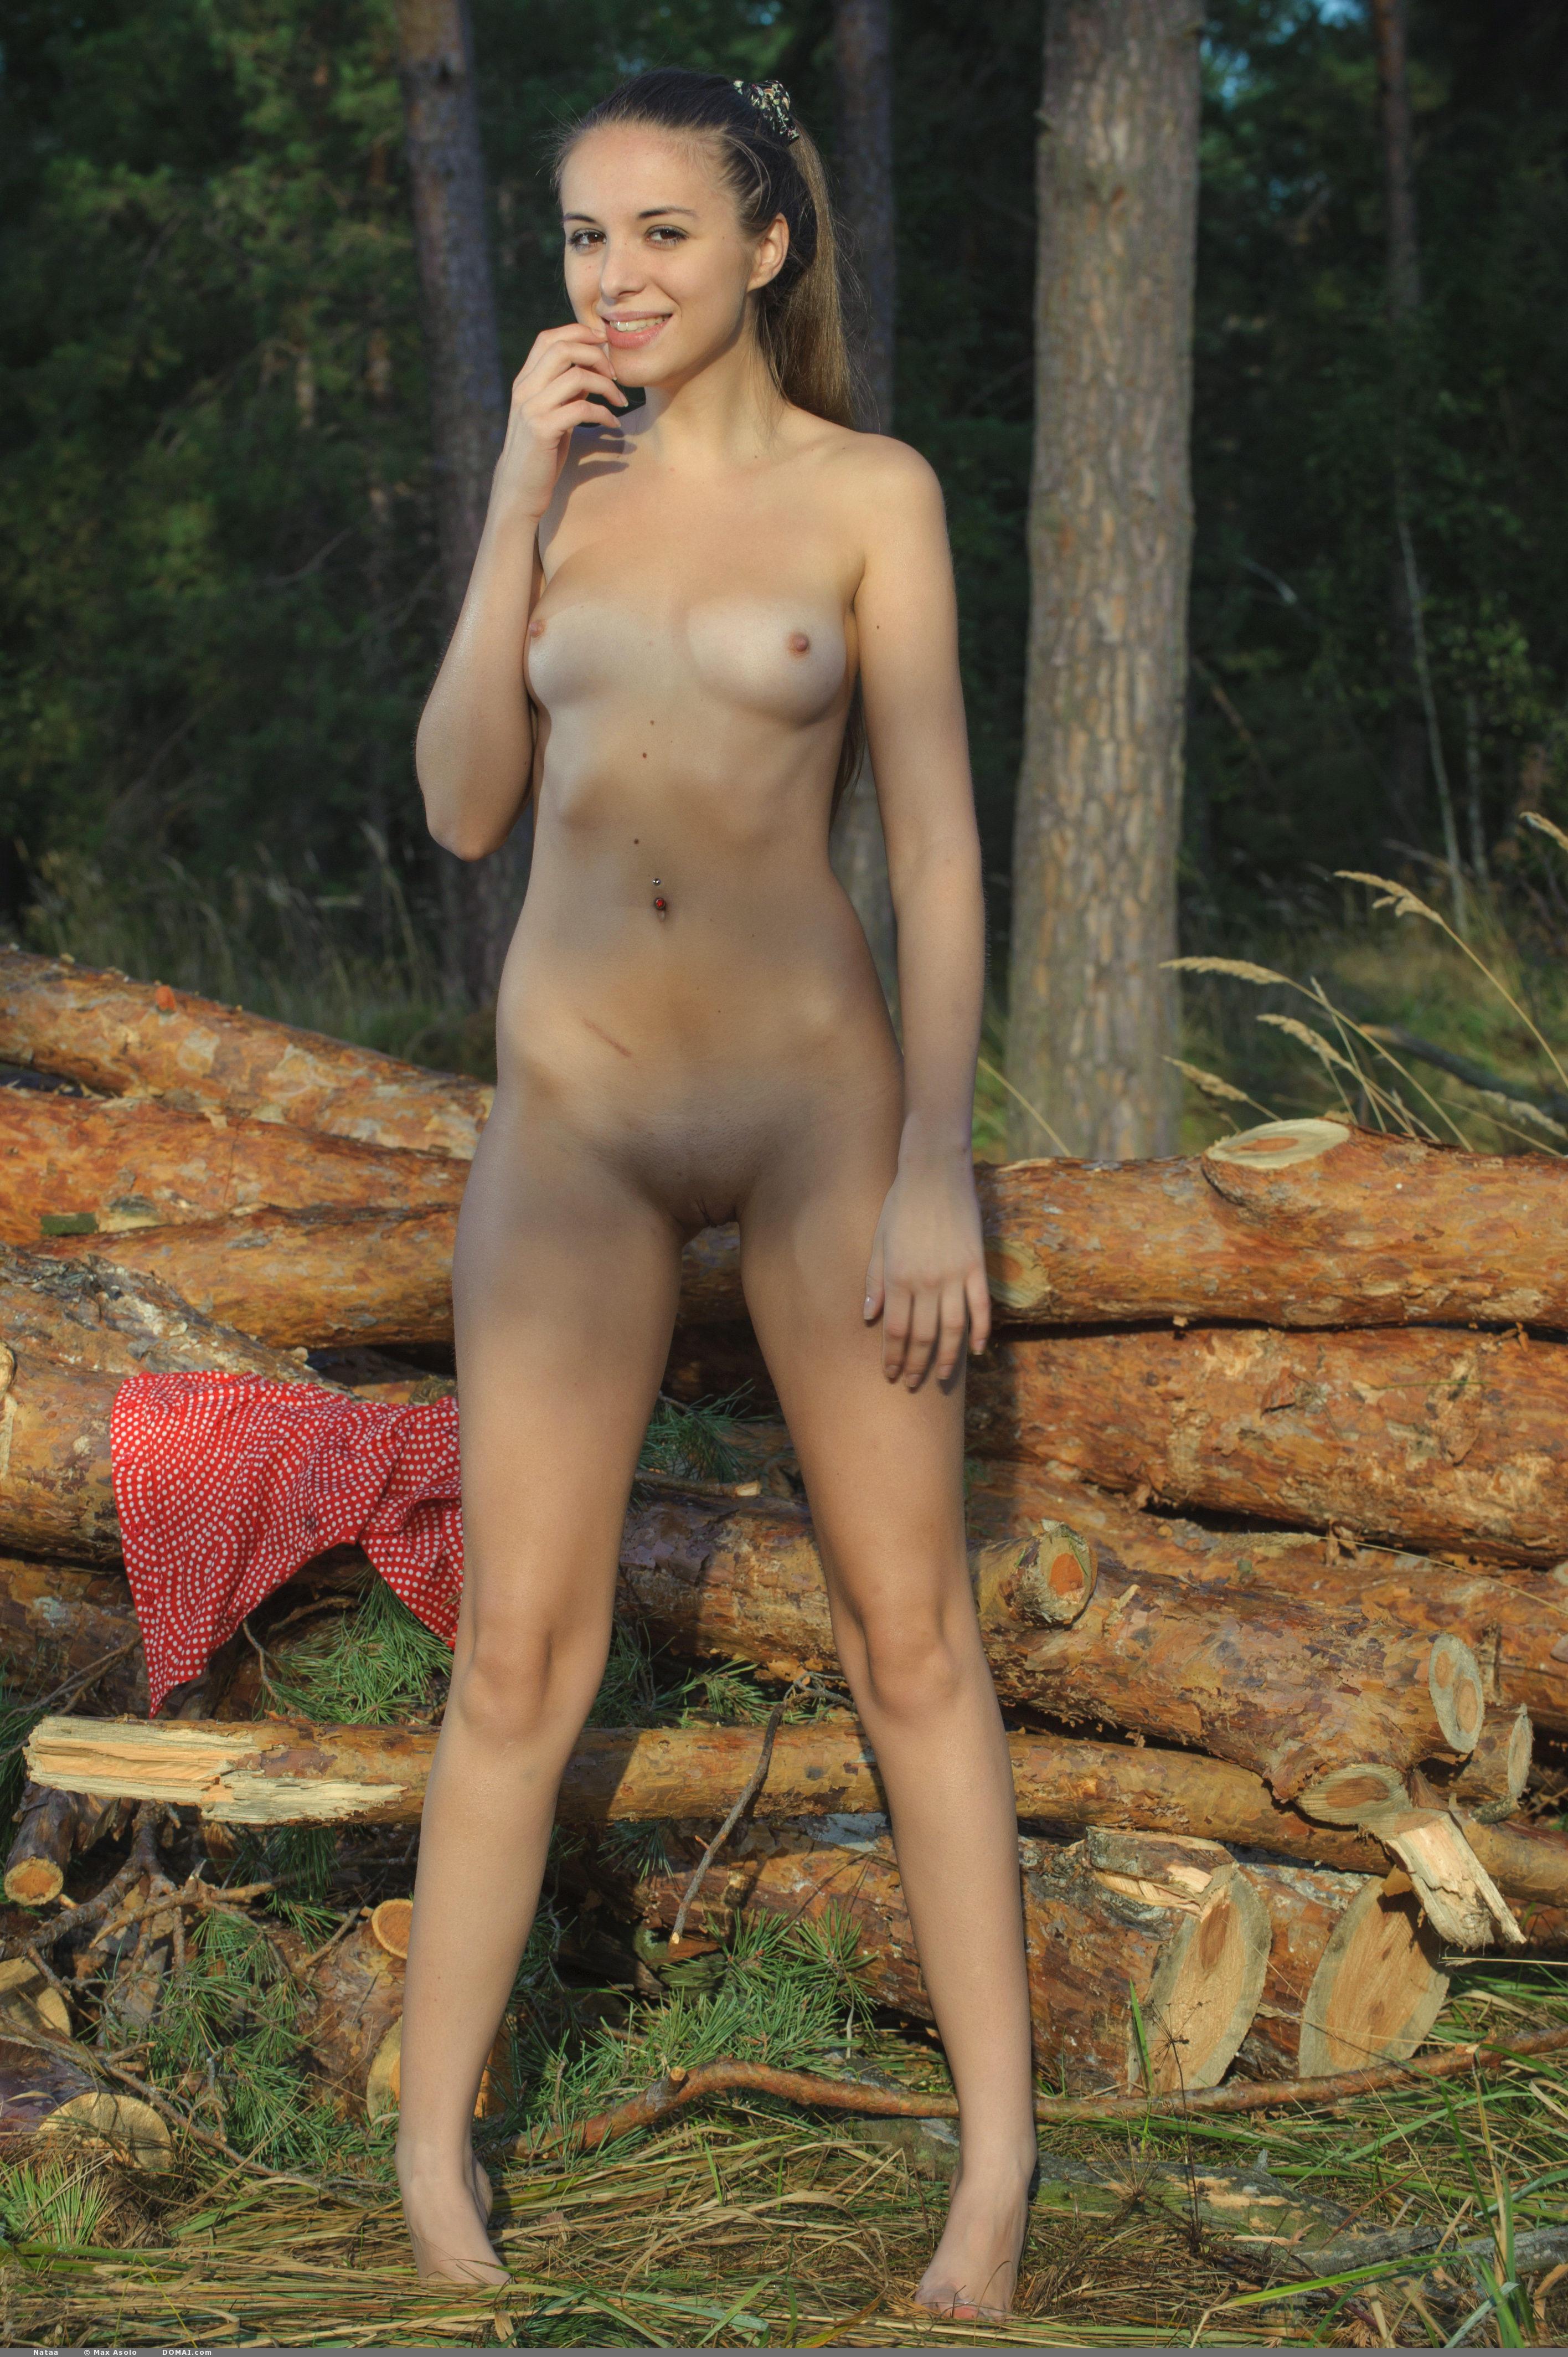 Antonina Goloseev Porn nataa nude in the woods porn pic - eporner